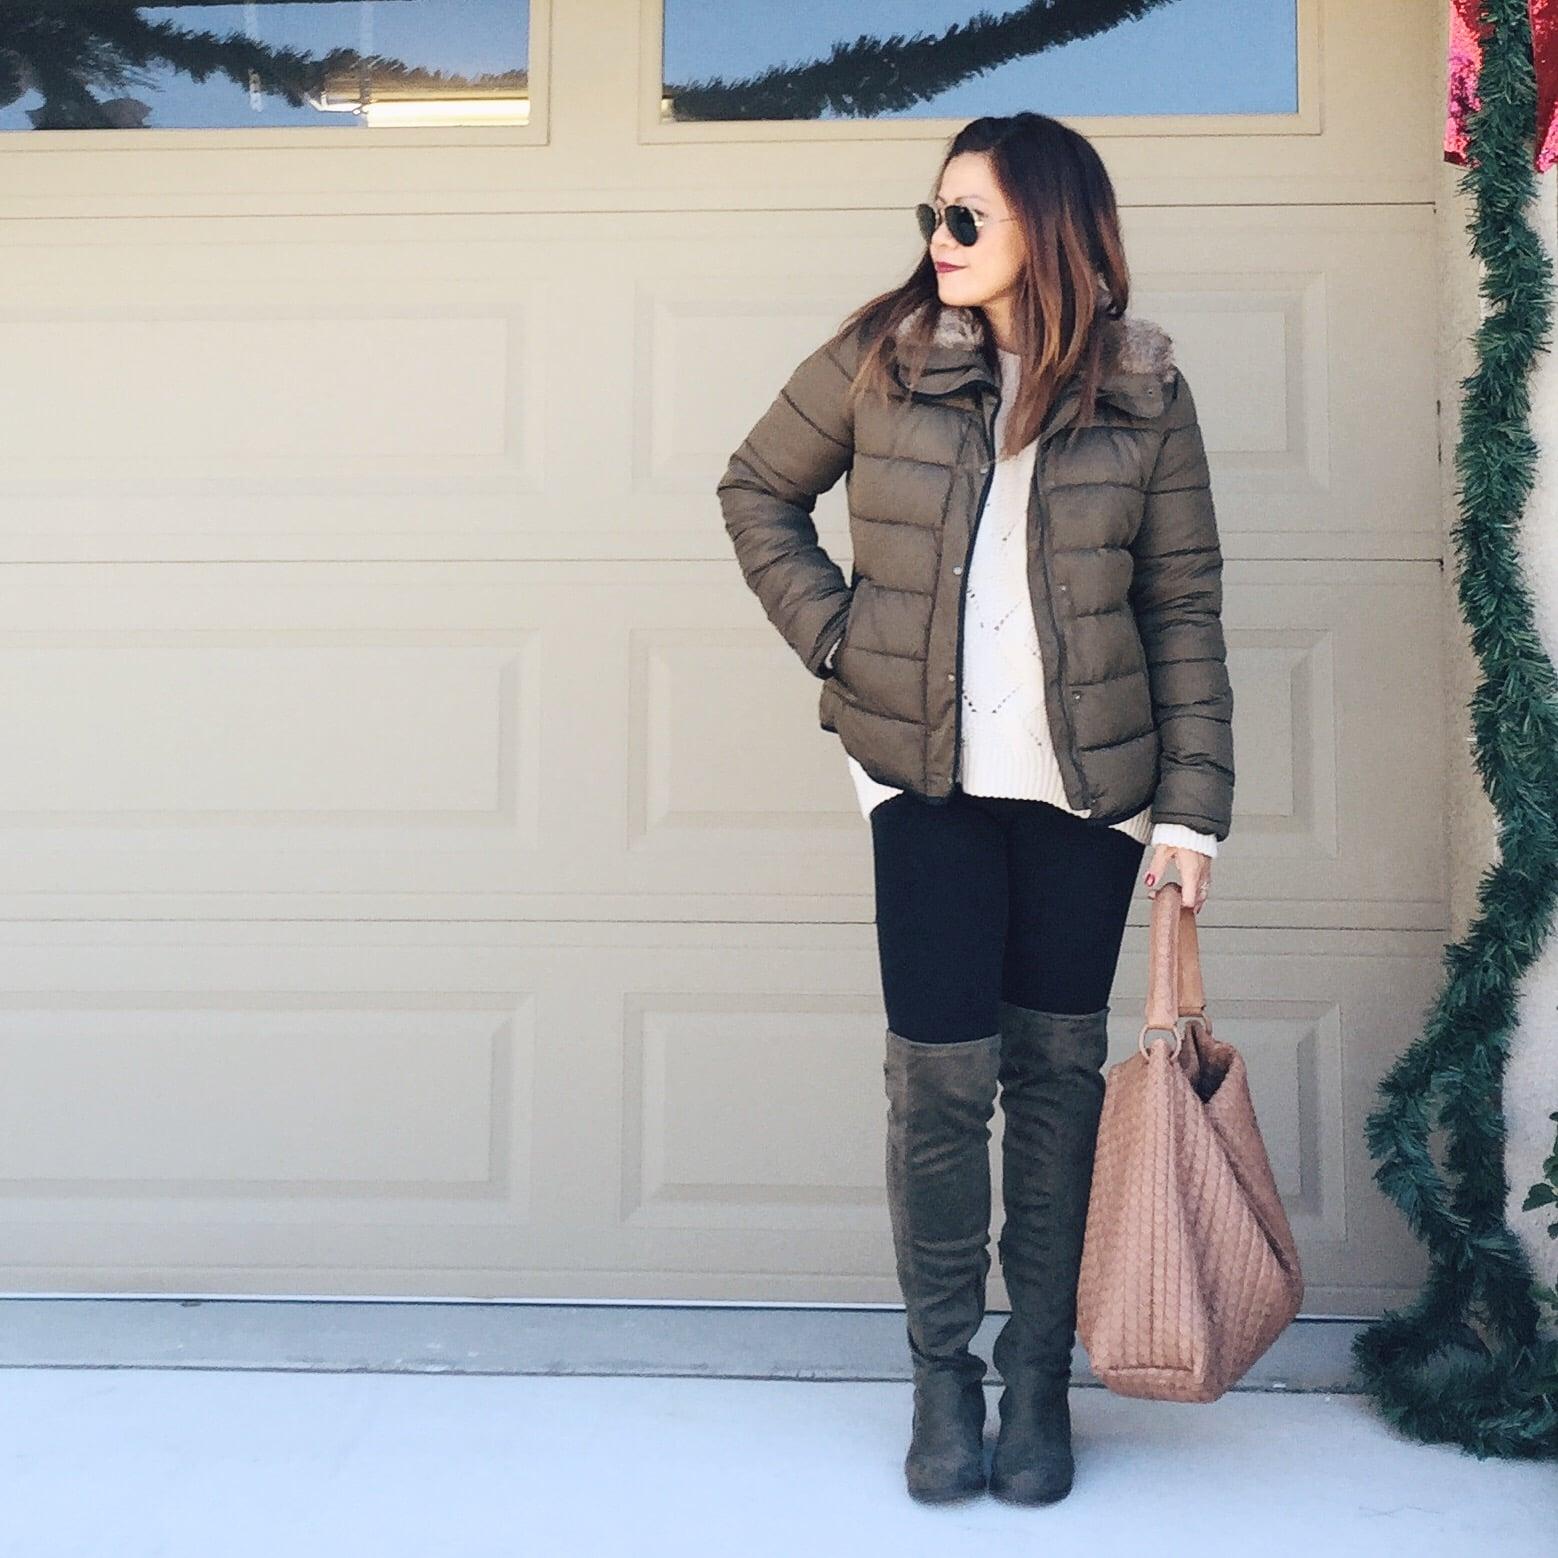 Old Navy jacket (similar  here ) - H&M  sweater  - Gap  skinny pants  -Shoedazzle  OTK boots